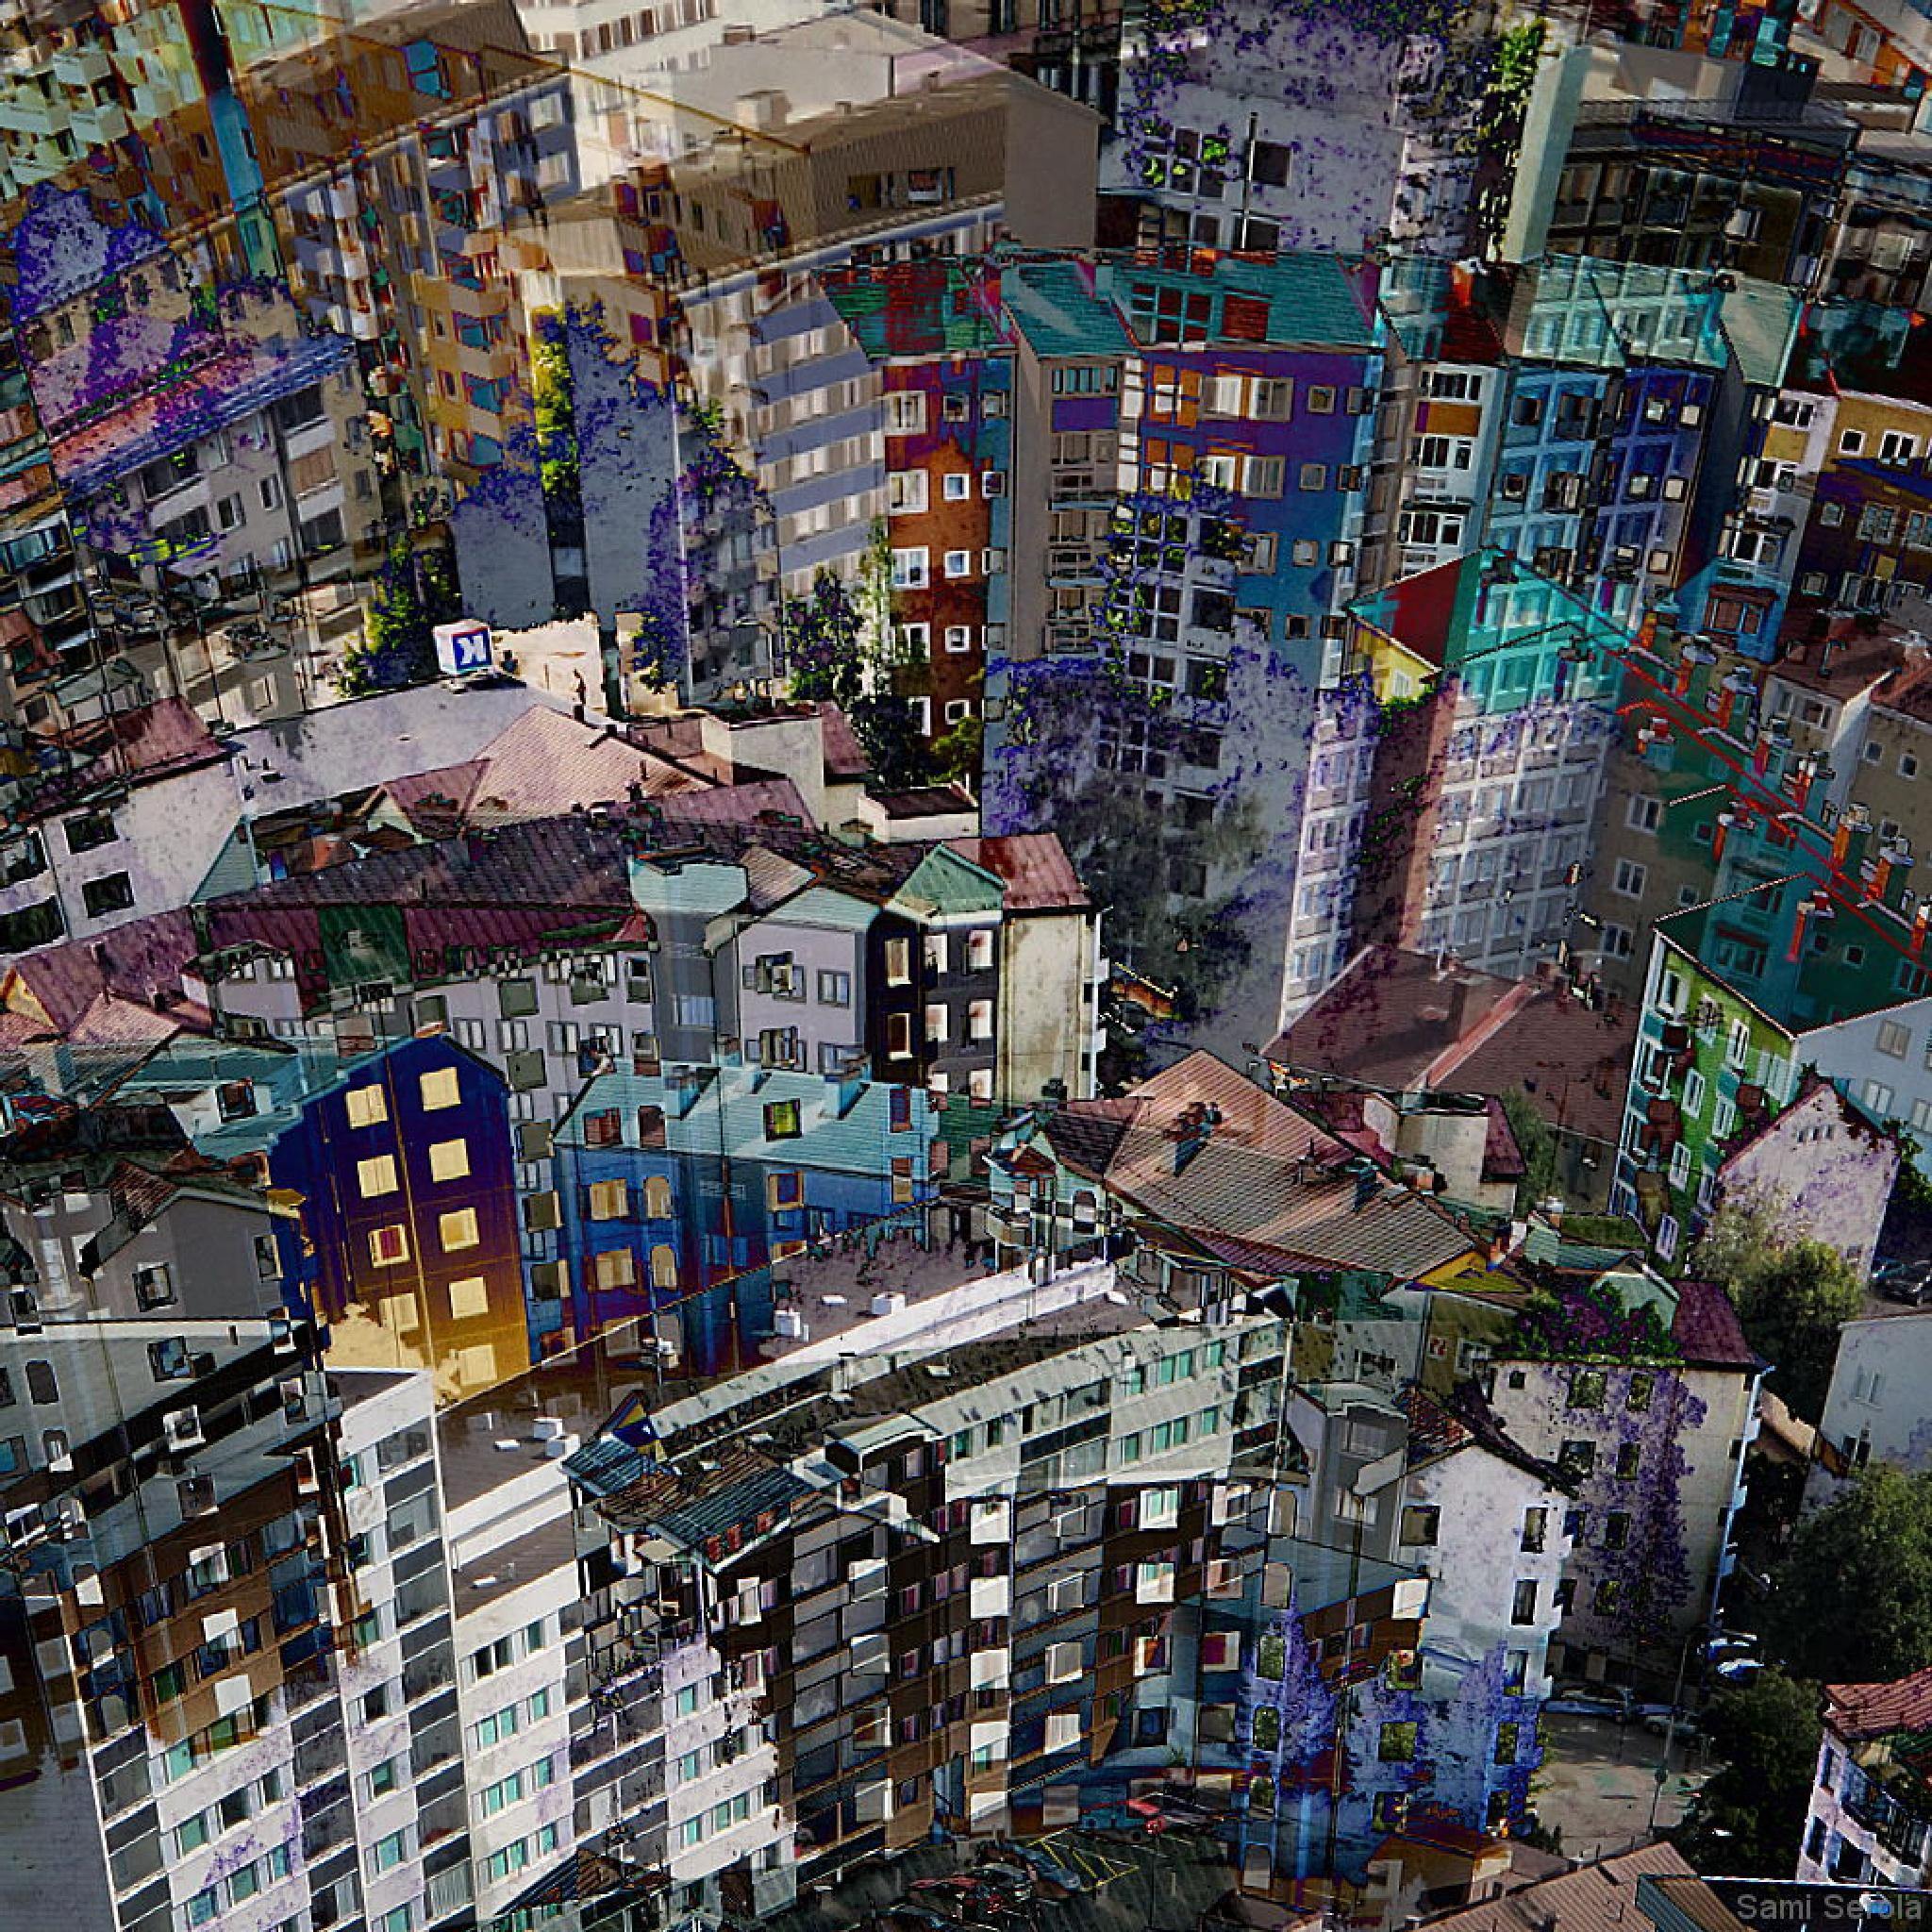 Essence of the city by Sami Serola